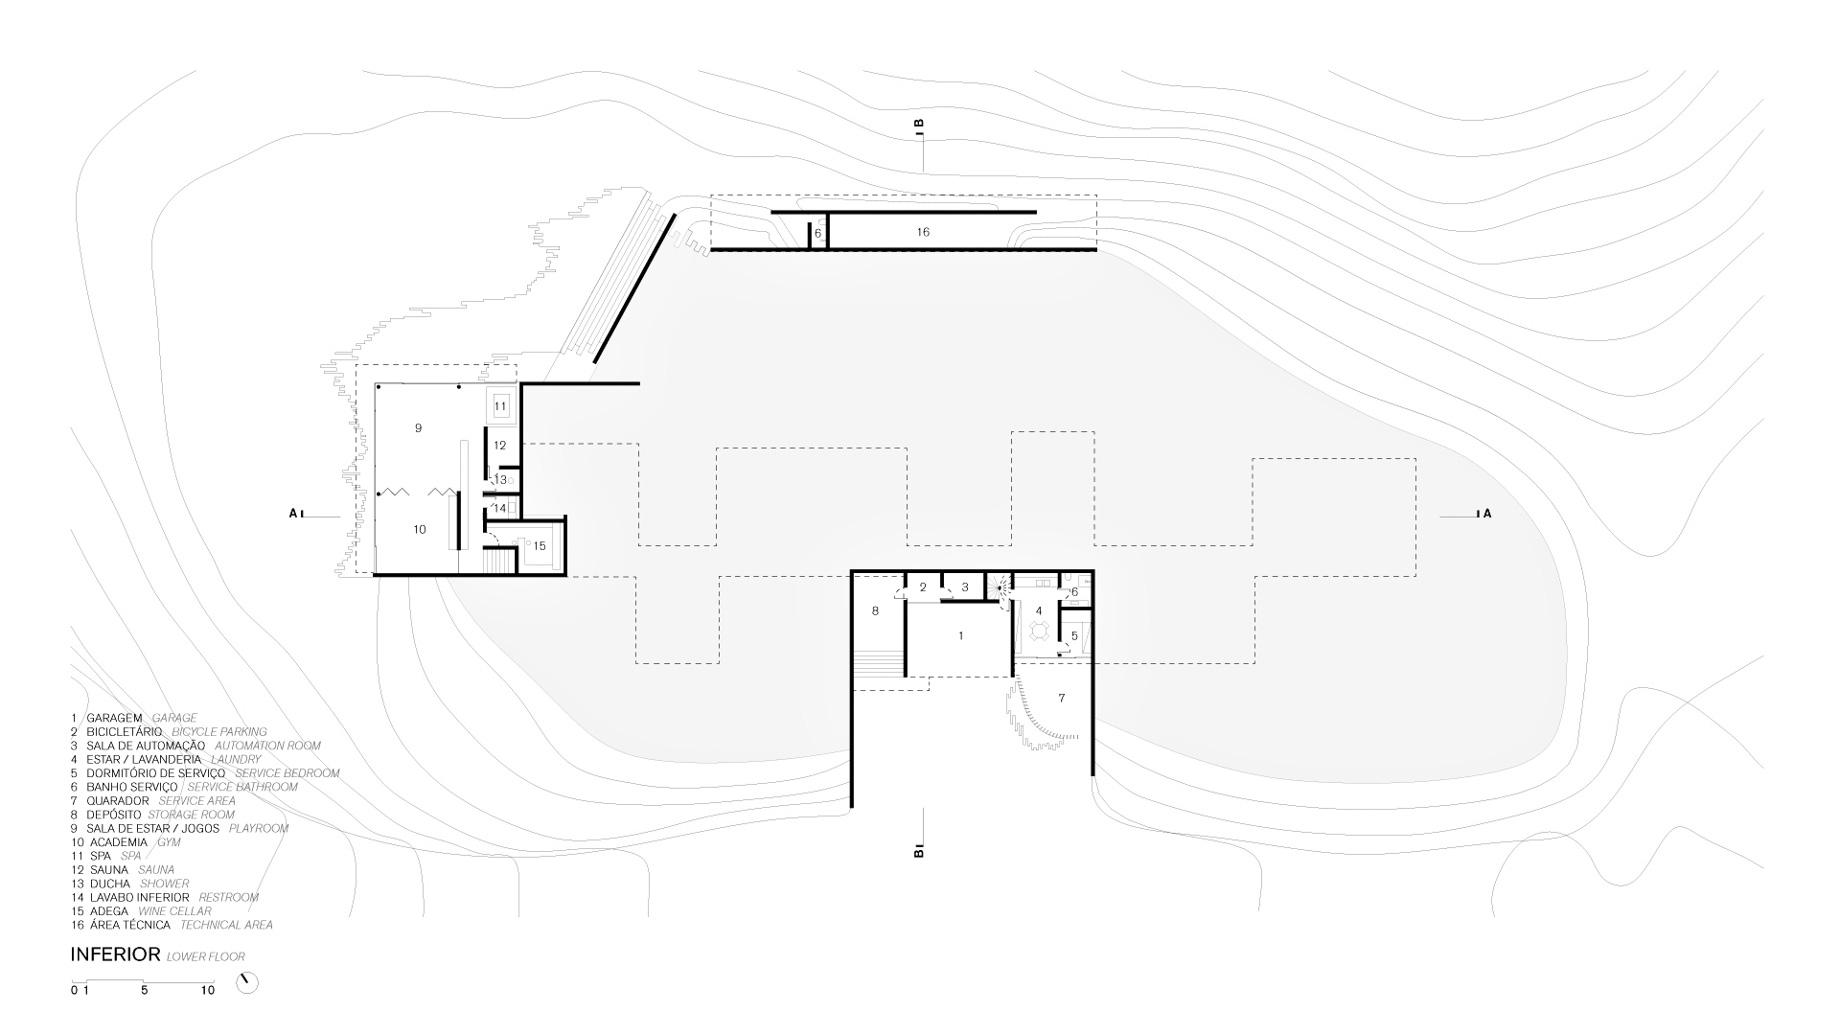 Lower Floor Plan - Casa Terra Residence - Itaipava, Petrópolis, Rio de Janeiro, Brazil